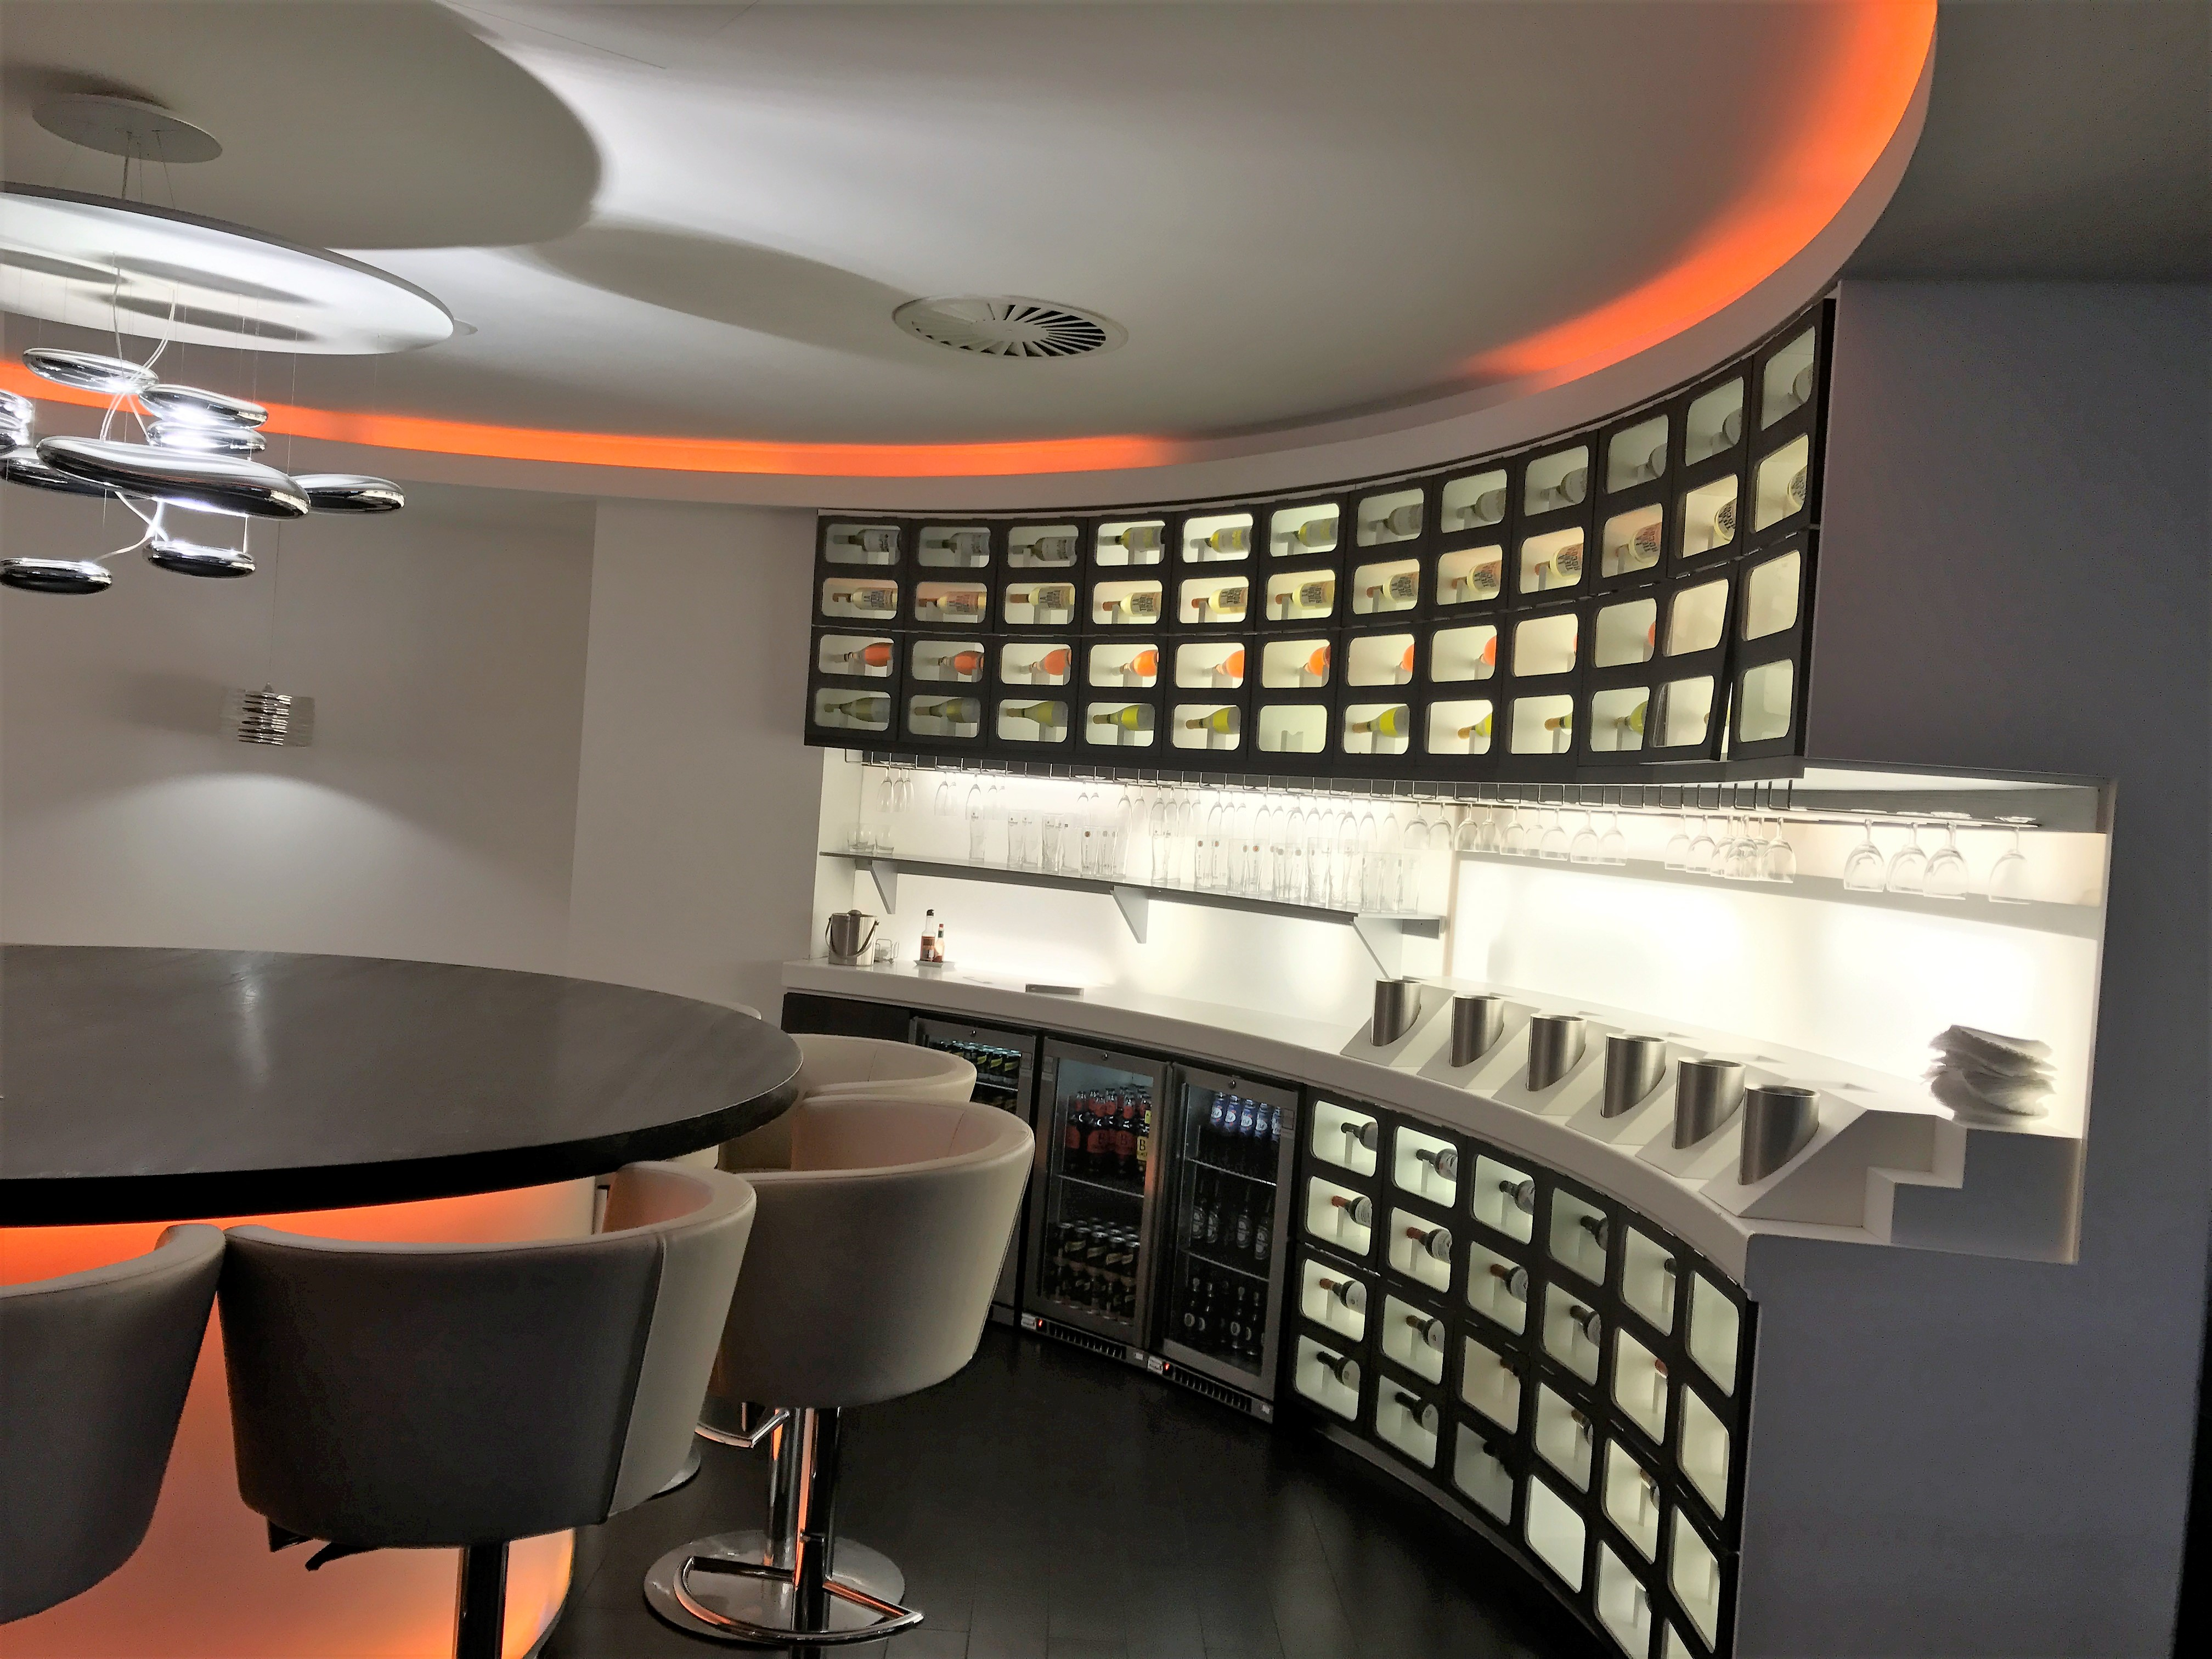 Skyteam lounge heathrow review